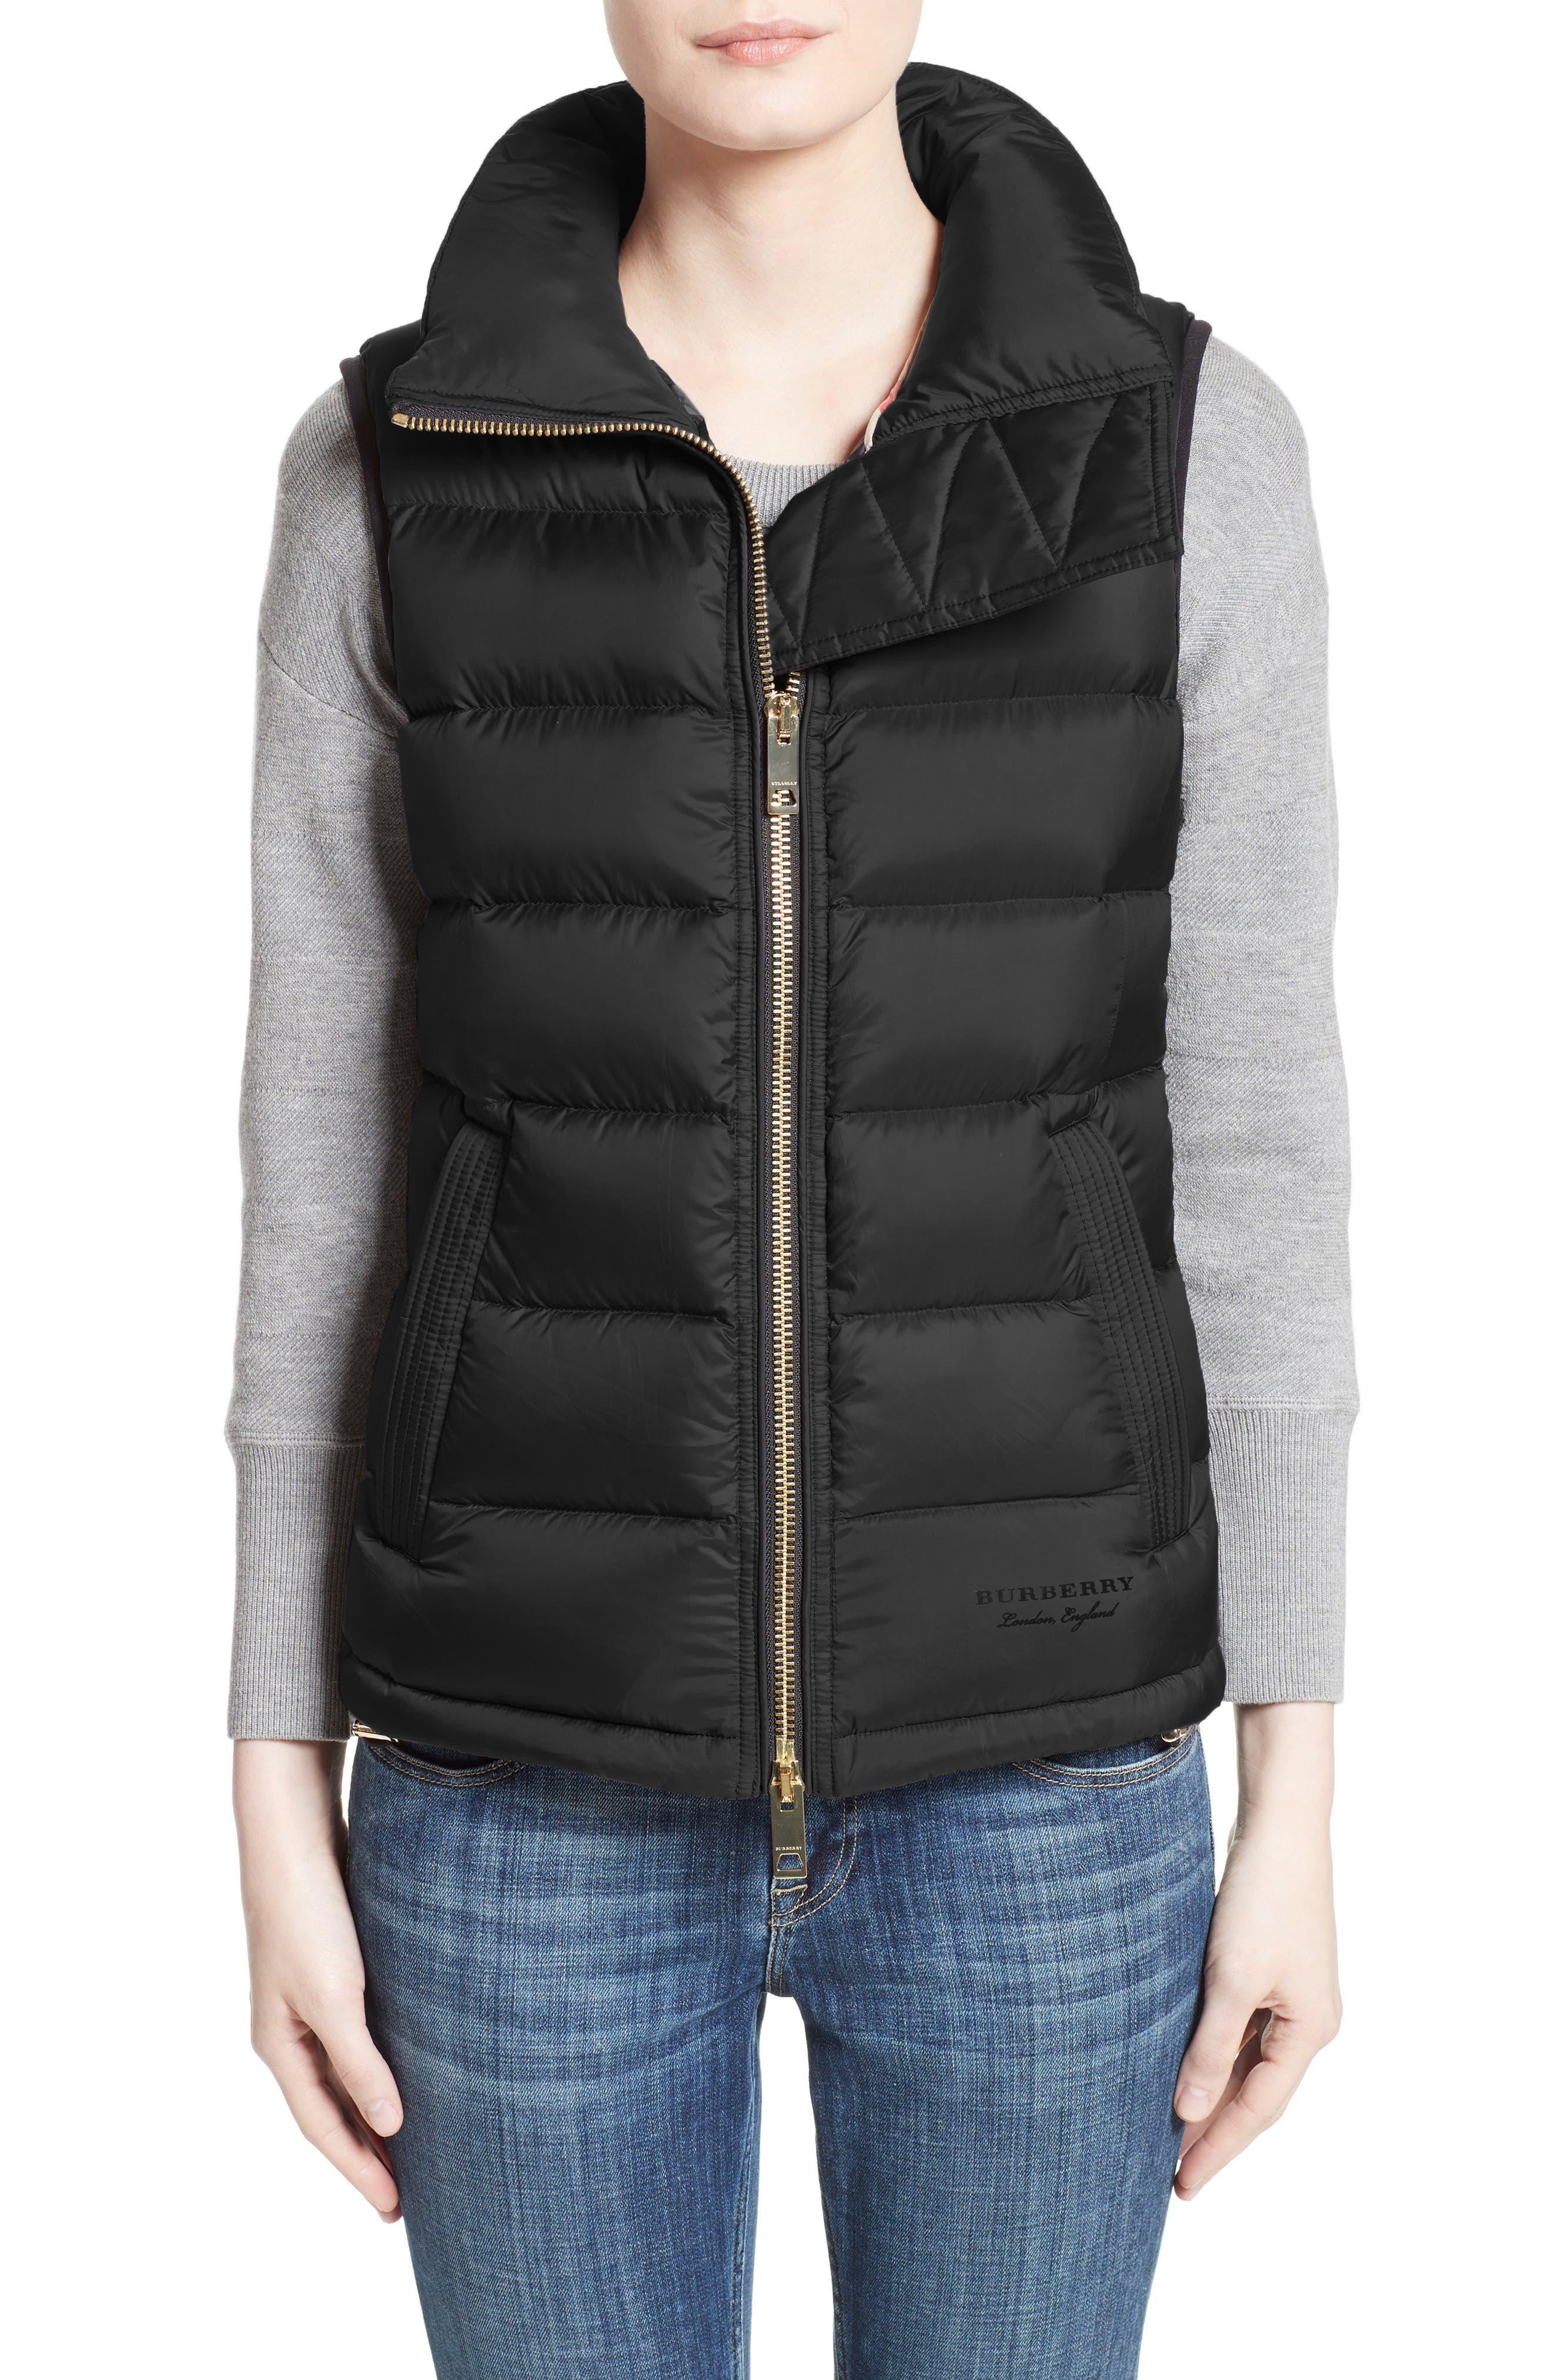 Burberry Women's Black Outerwear: Coats & Jackets | Nordstrom ...